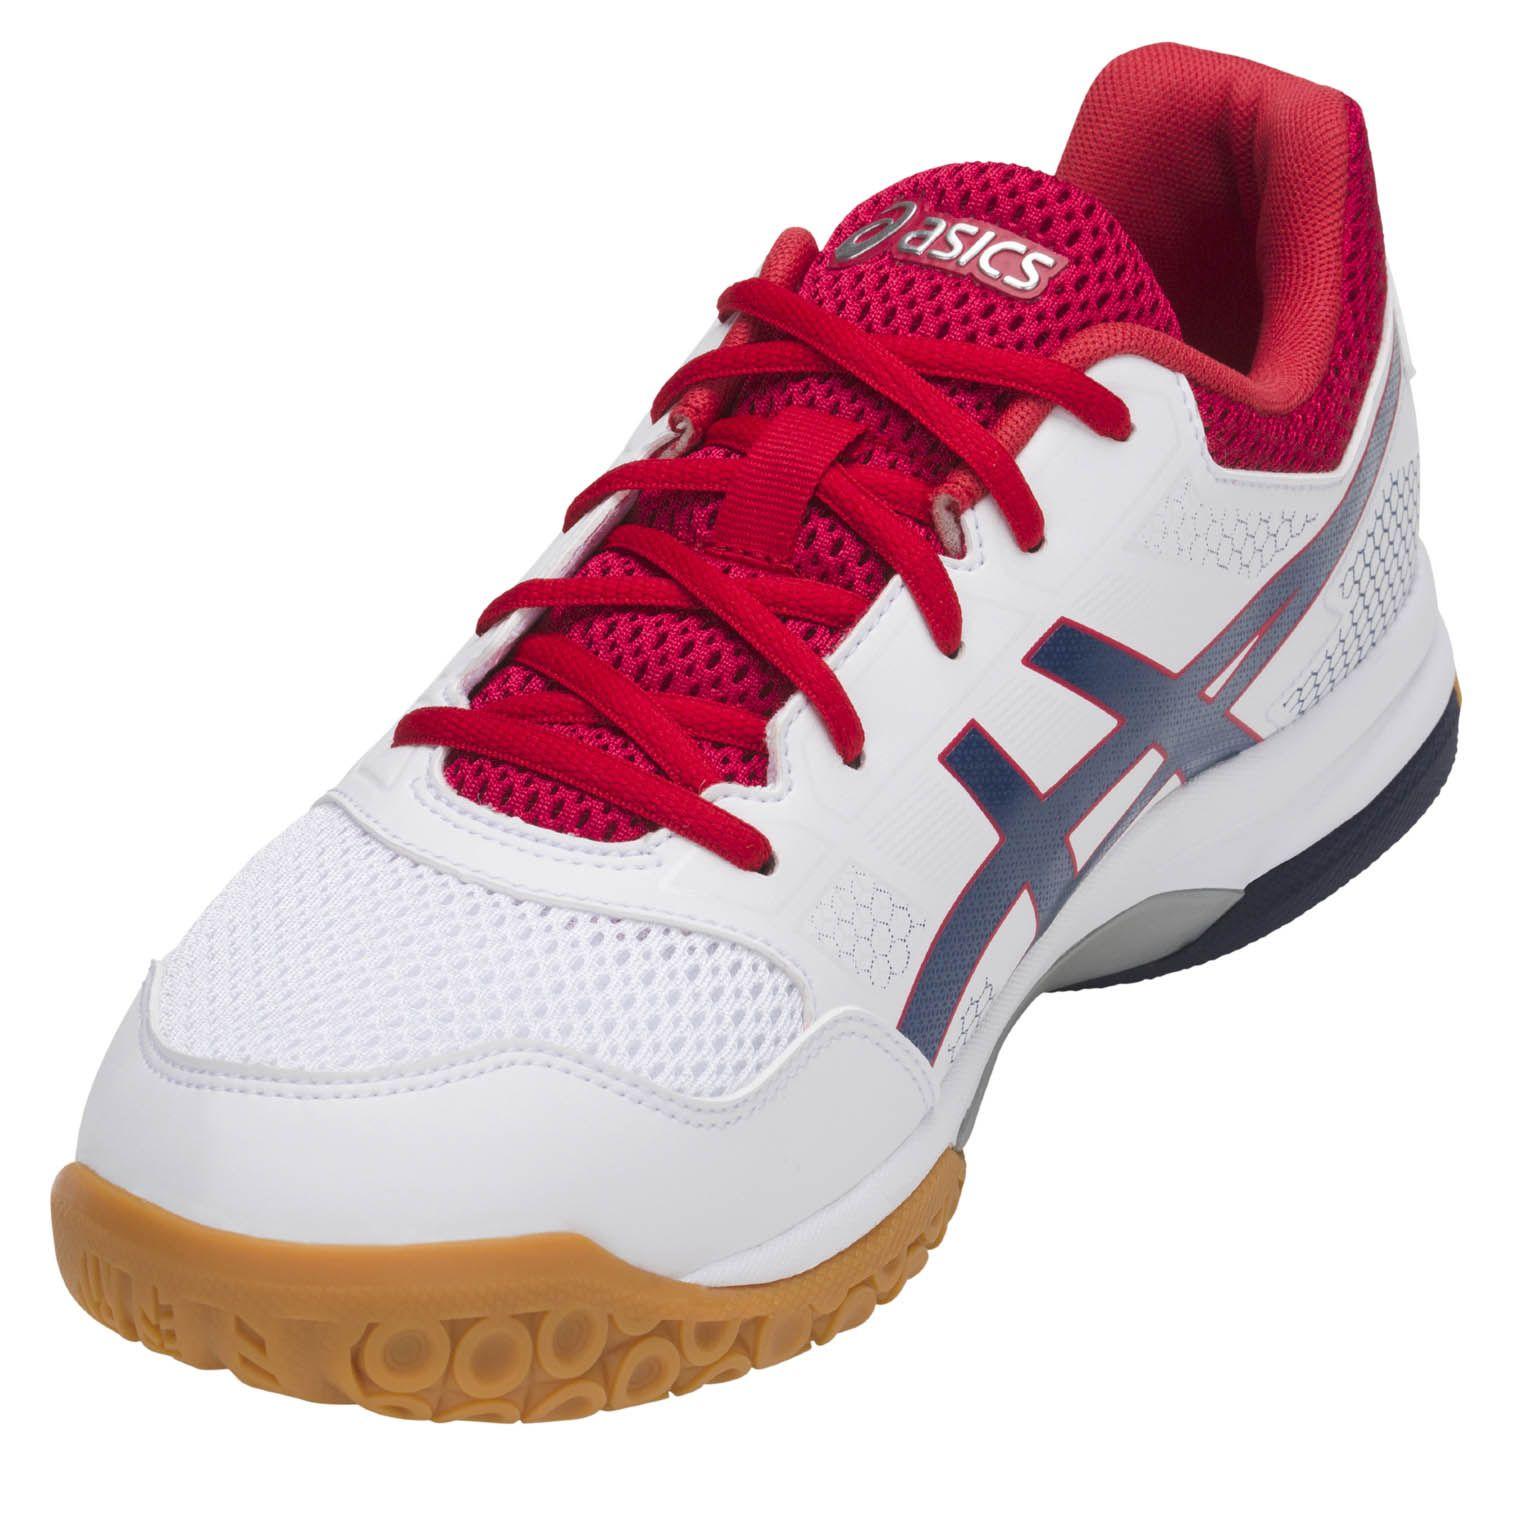 Asics Men S Gel Rocket  Badminton Shoes